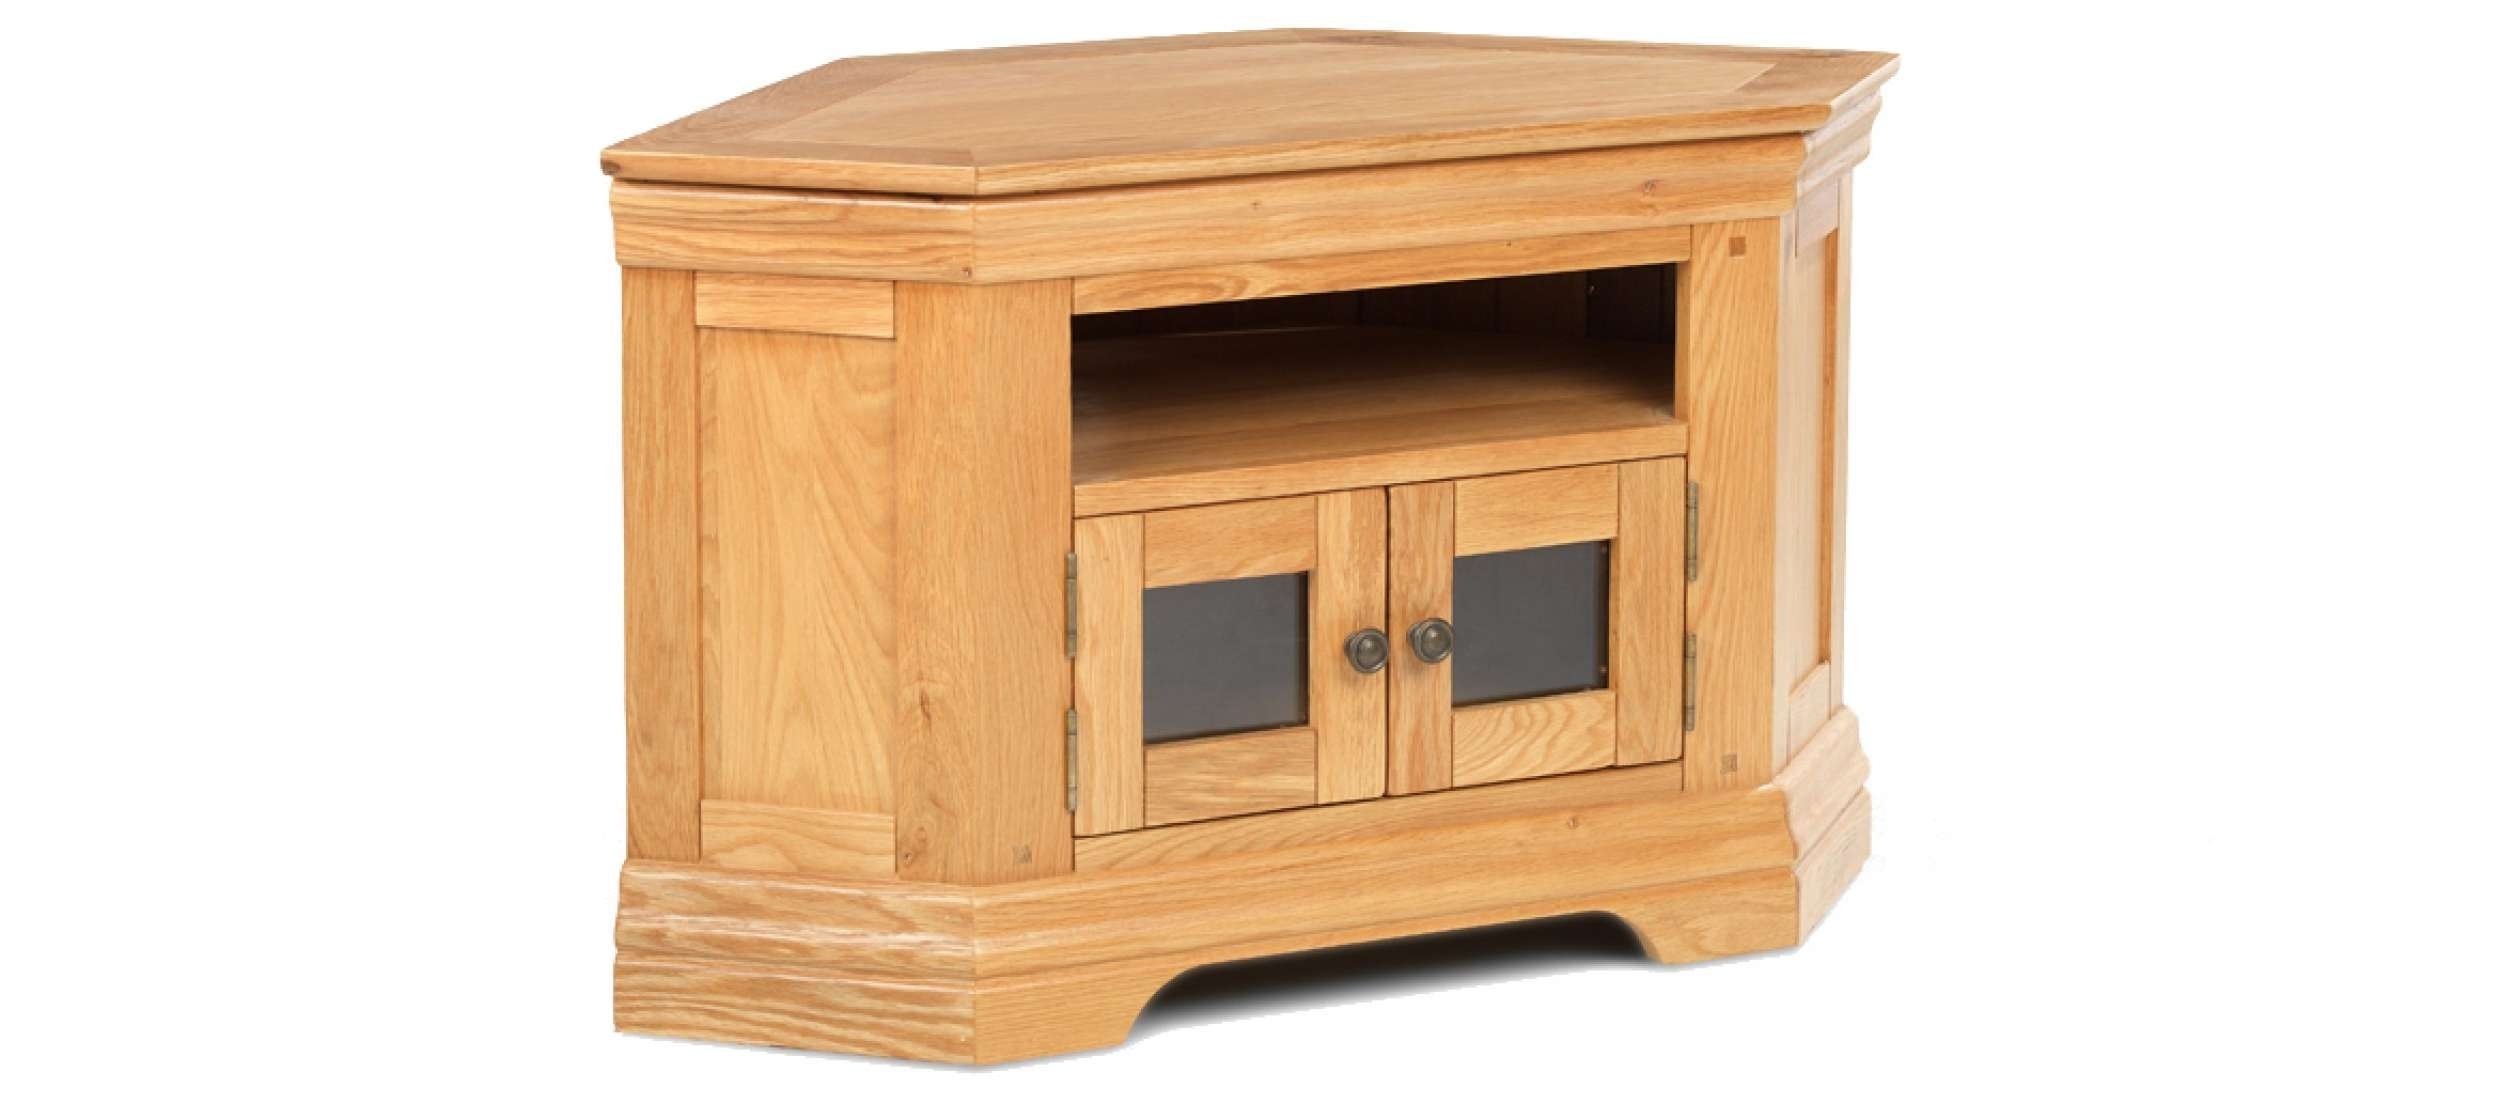 Constance Oak Corner Tv Cabinet | Quercus Living In Small Oak Corner Tv Stands (View 12 of 15)